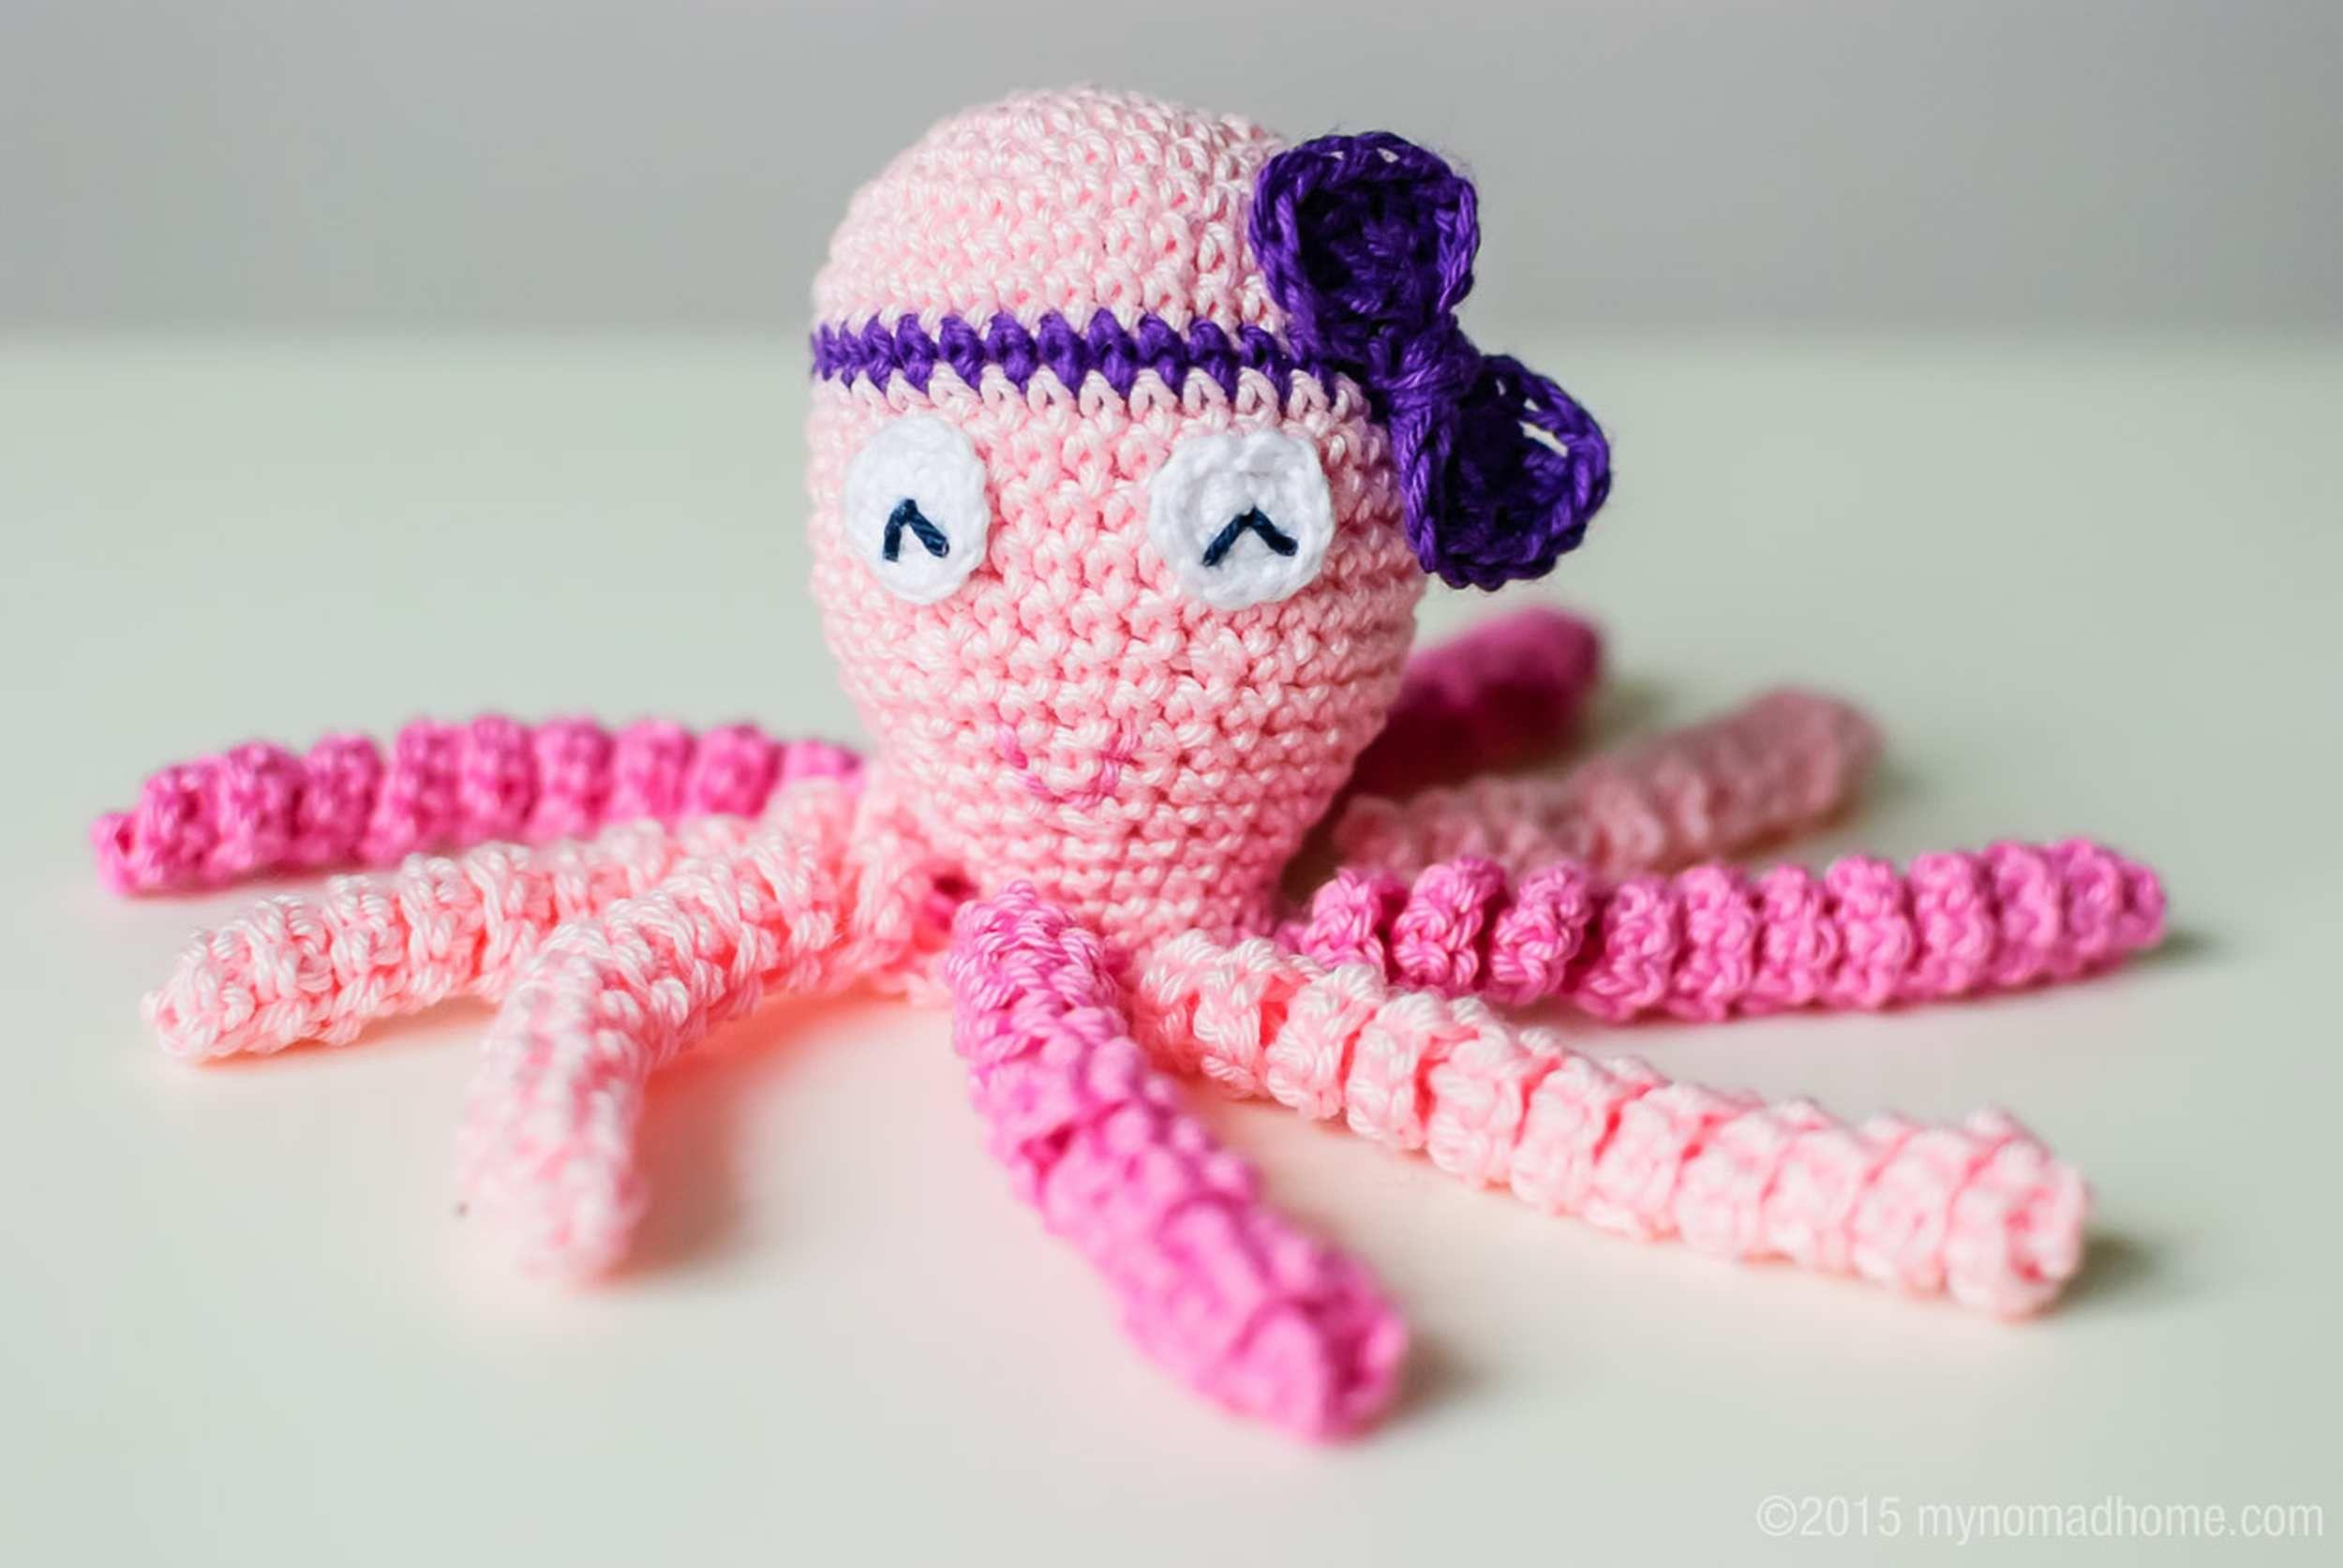 octopus for a preemie | Inspiracje | Pinterest | Preemies, Crochet ...